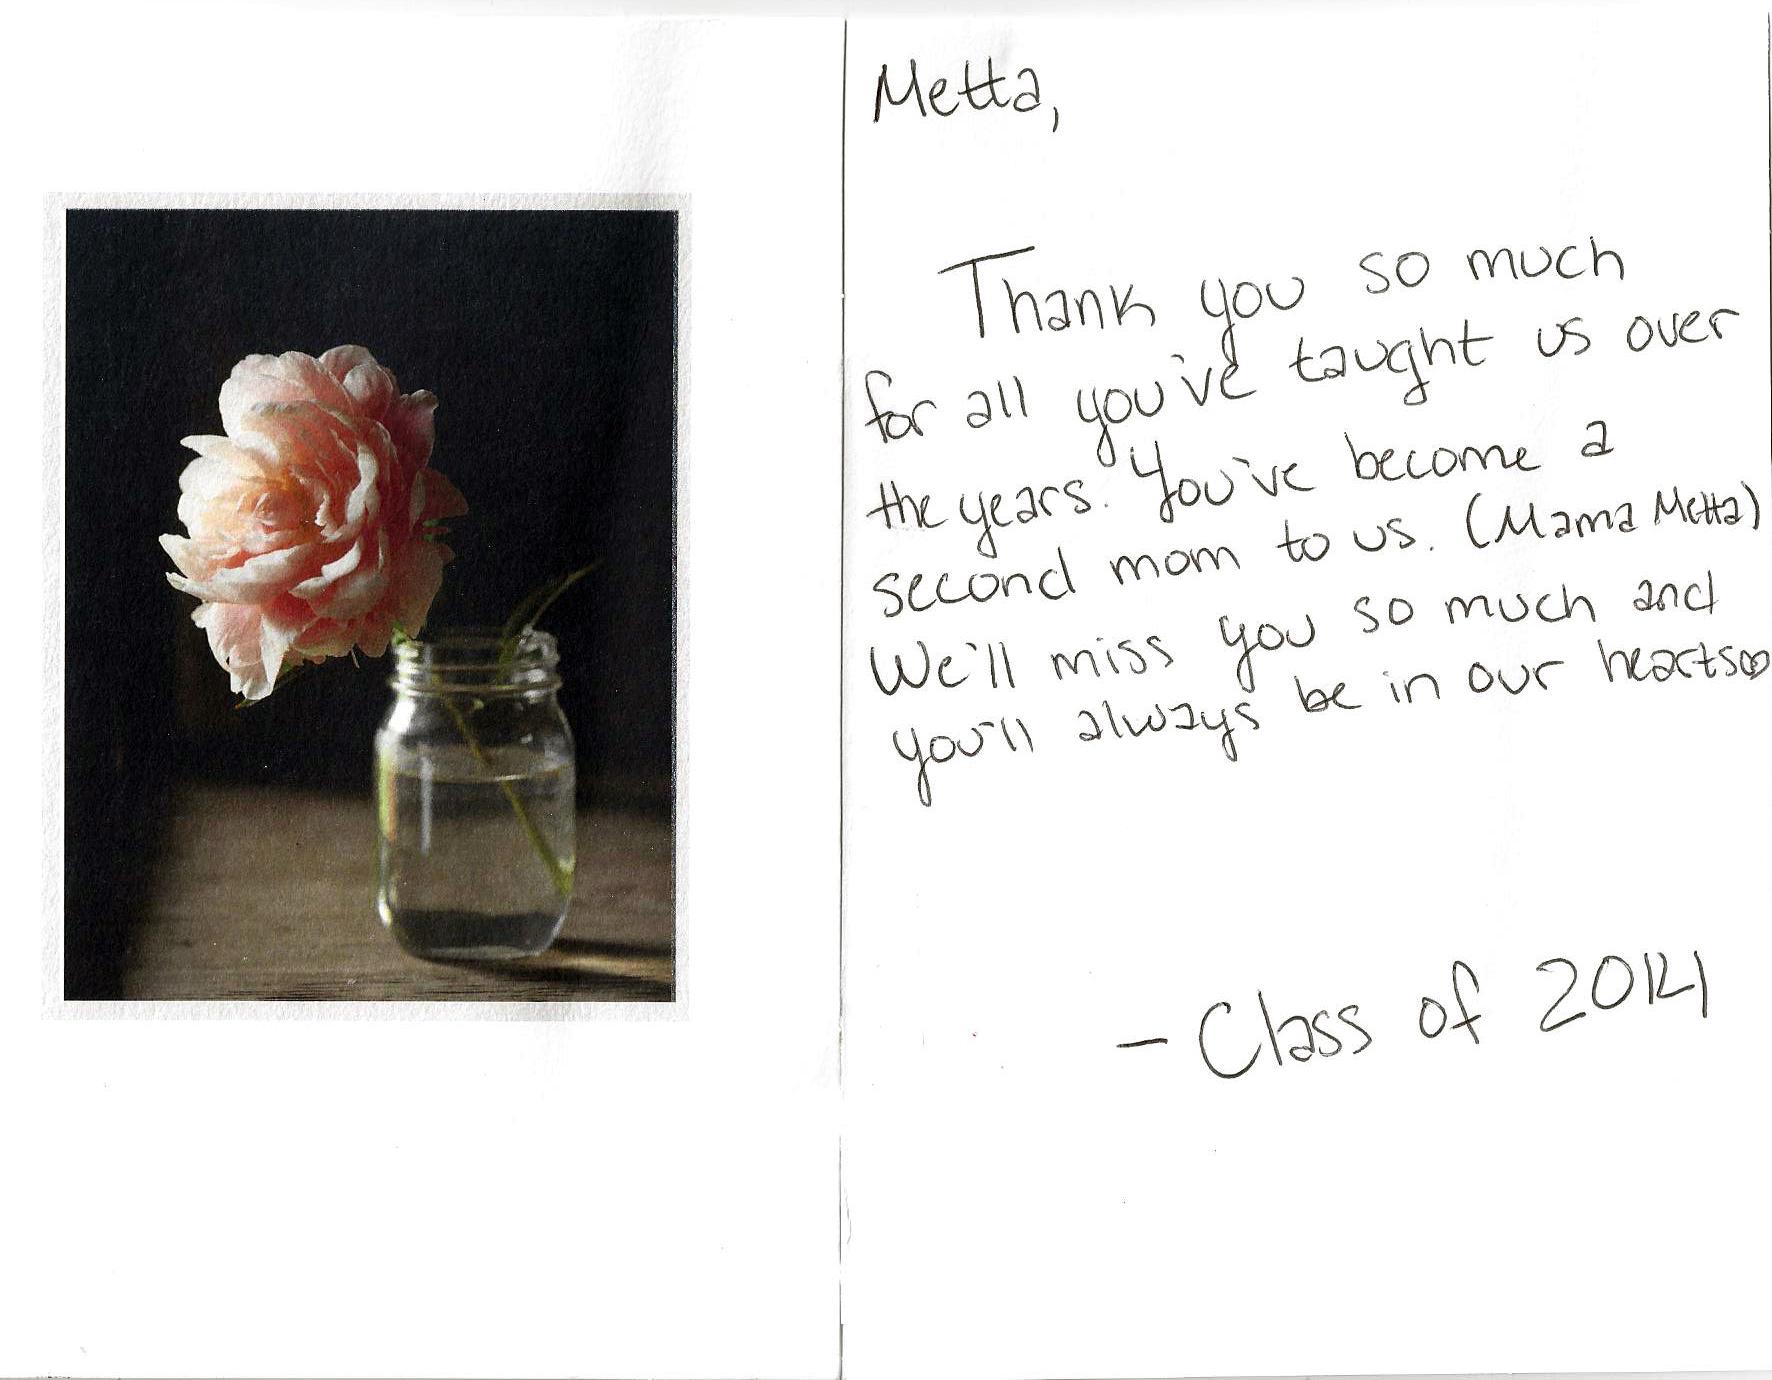 Class letter 2014